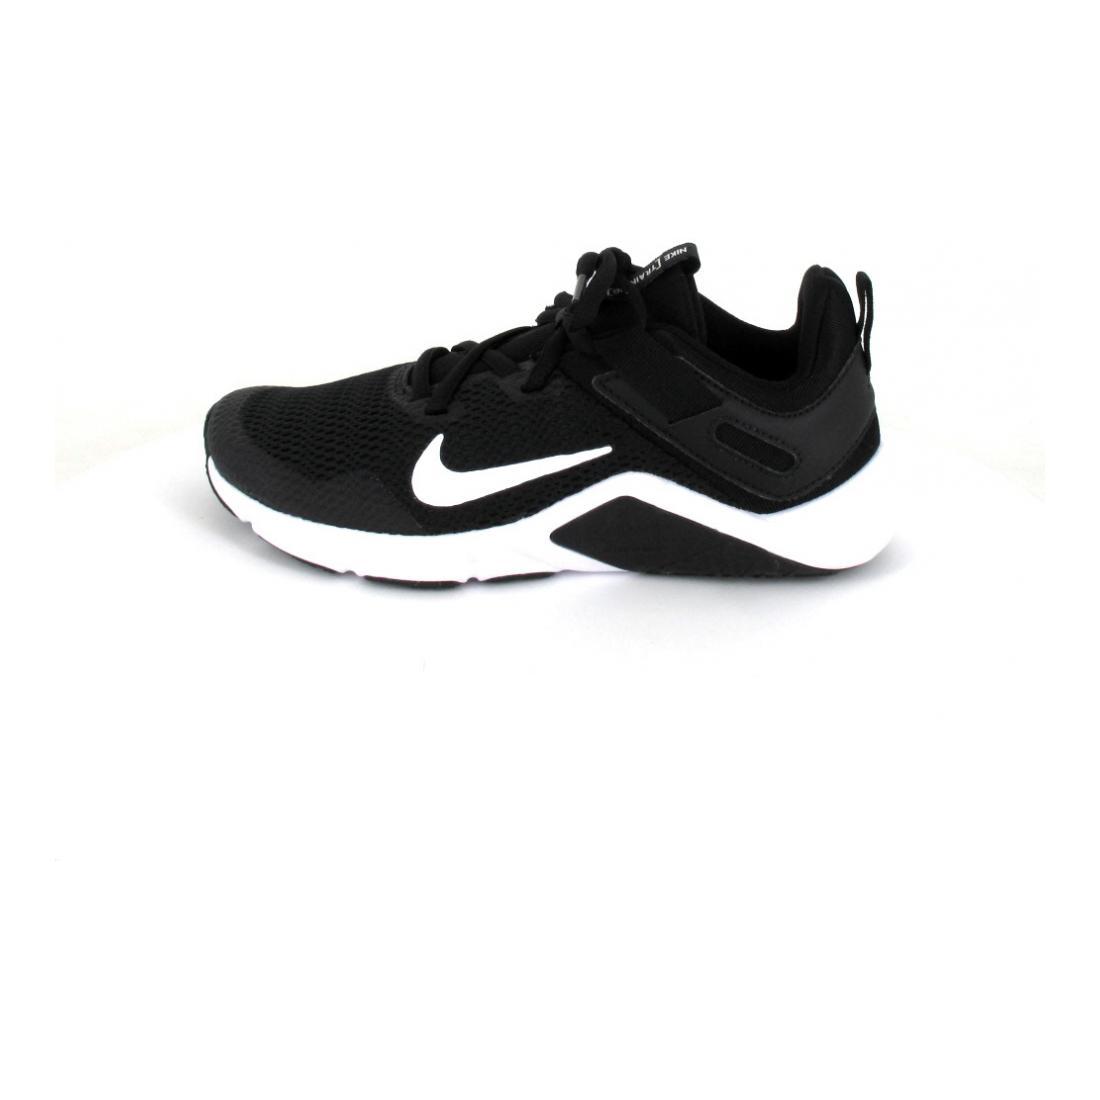 WMNS Legend Wo EssentialSchuh Sportschuh Nike Welt 9H2EIWD